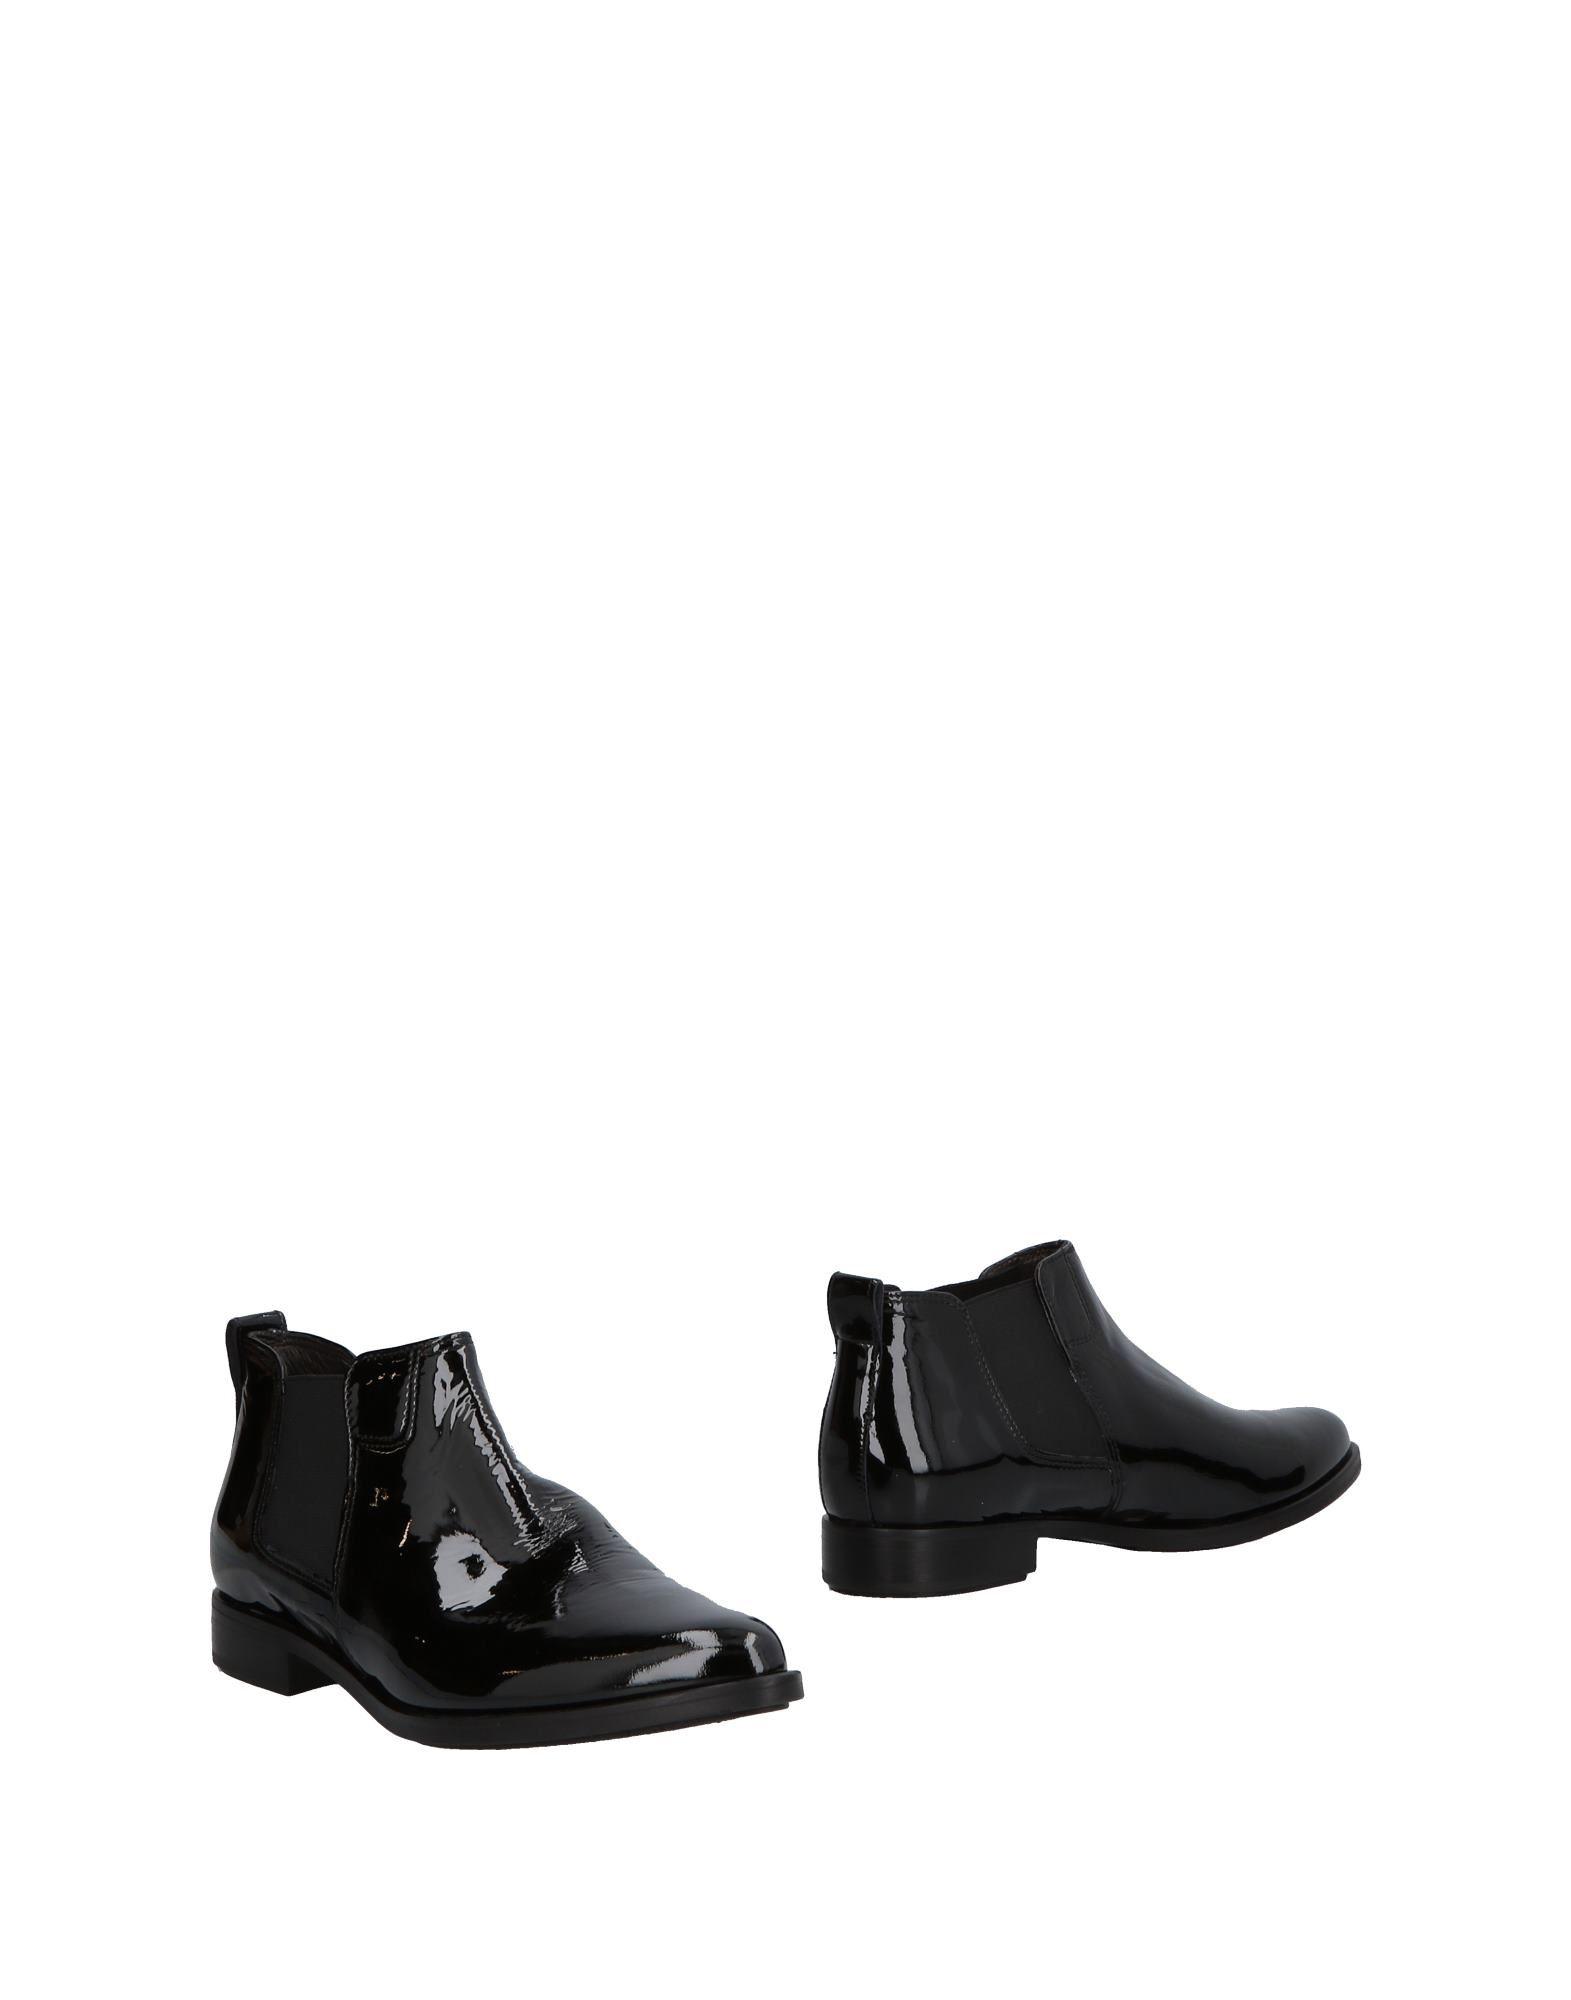 все цены на MARCO FERRETTI Полусапоги и высокие ботинки